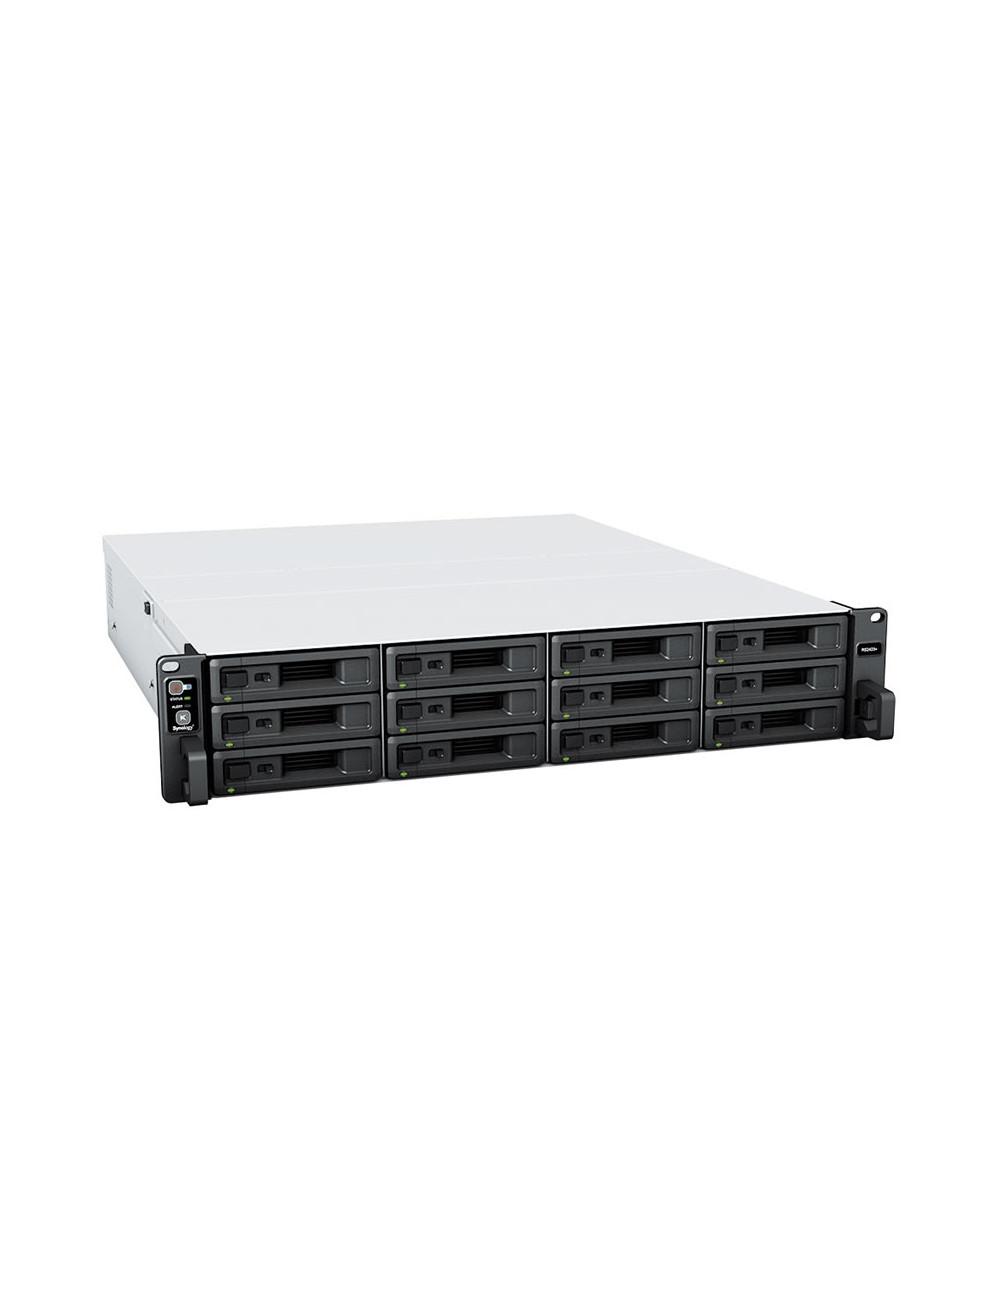 Synology DS218+ 2GB NAS Server (Diskless)